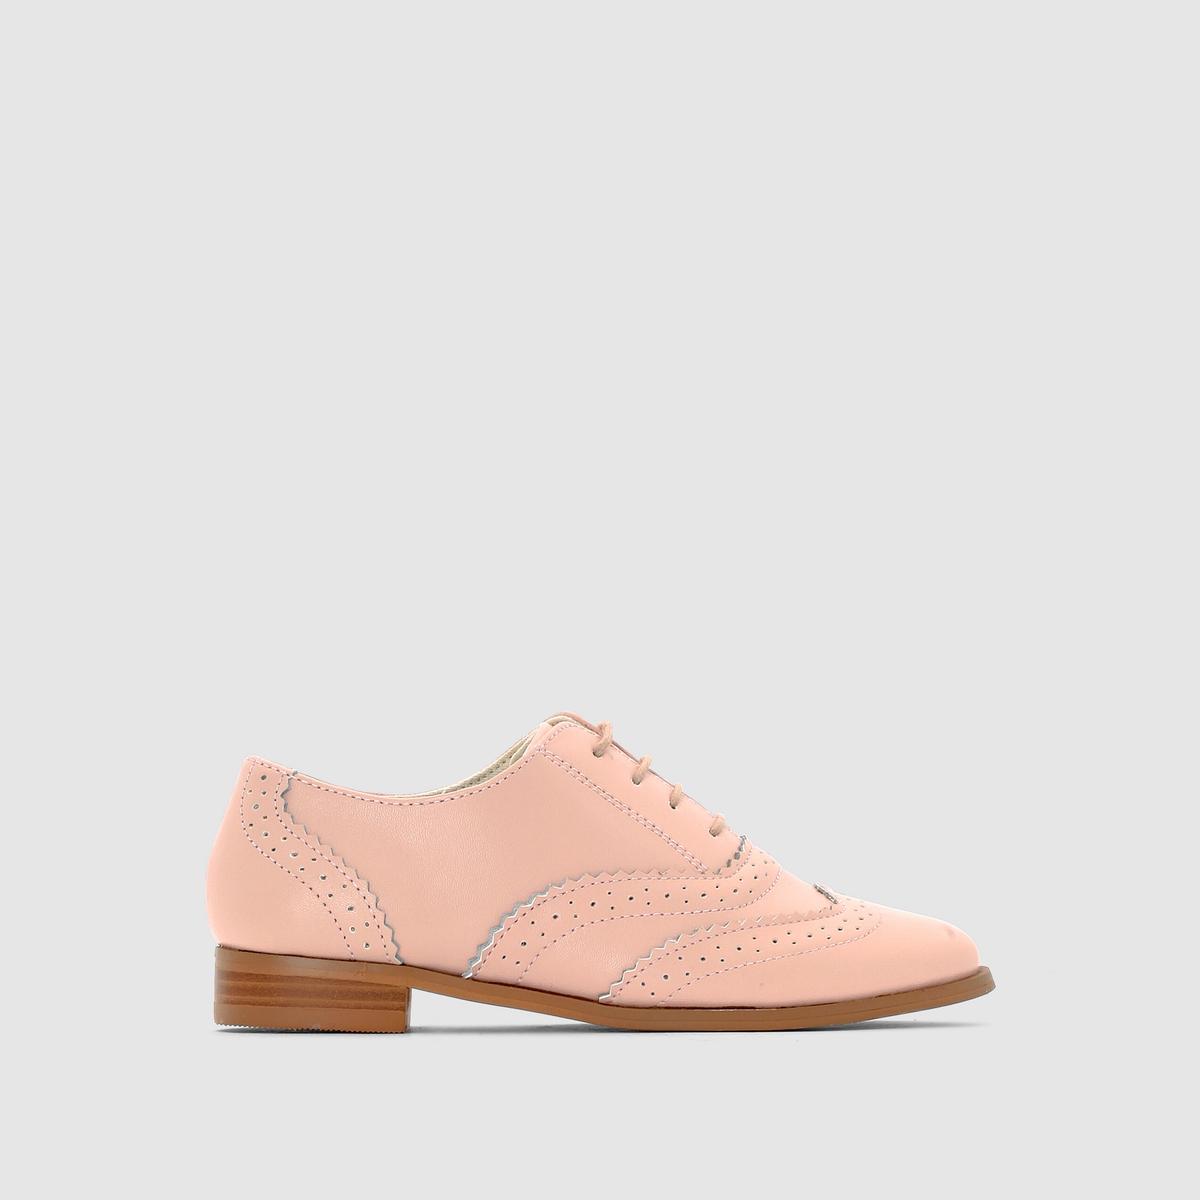 Ботинки-дерби из кожи с перфорацией от La Redoute